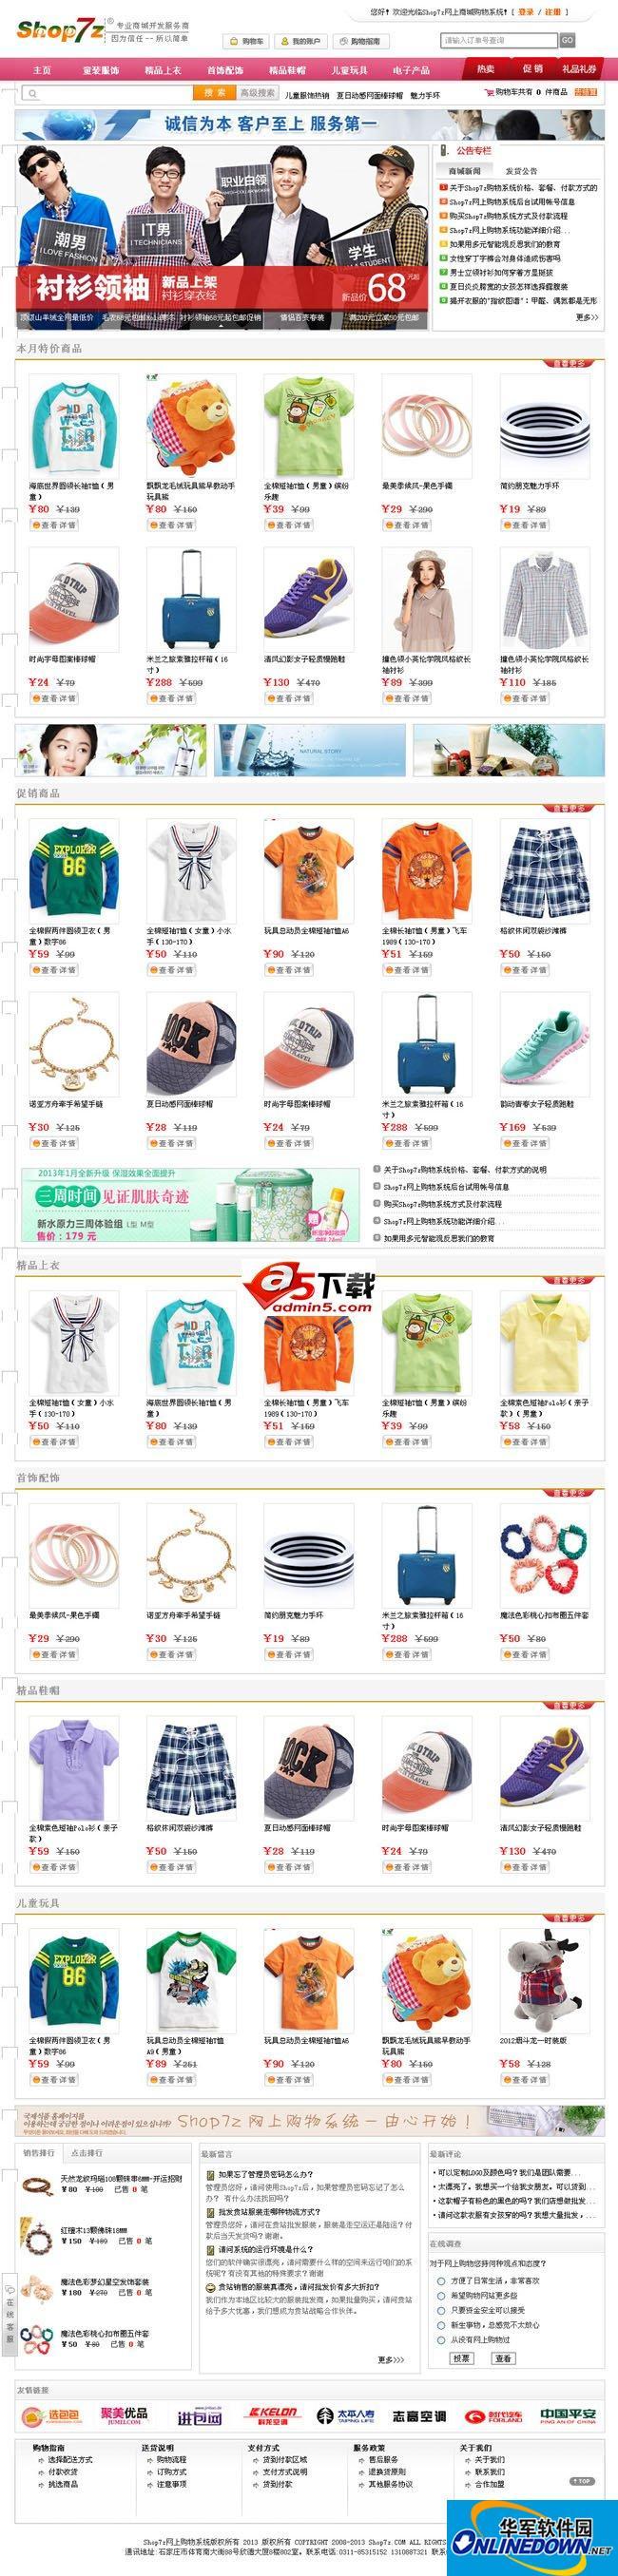 Shop7z网上购物系统 39238 时尚版